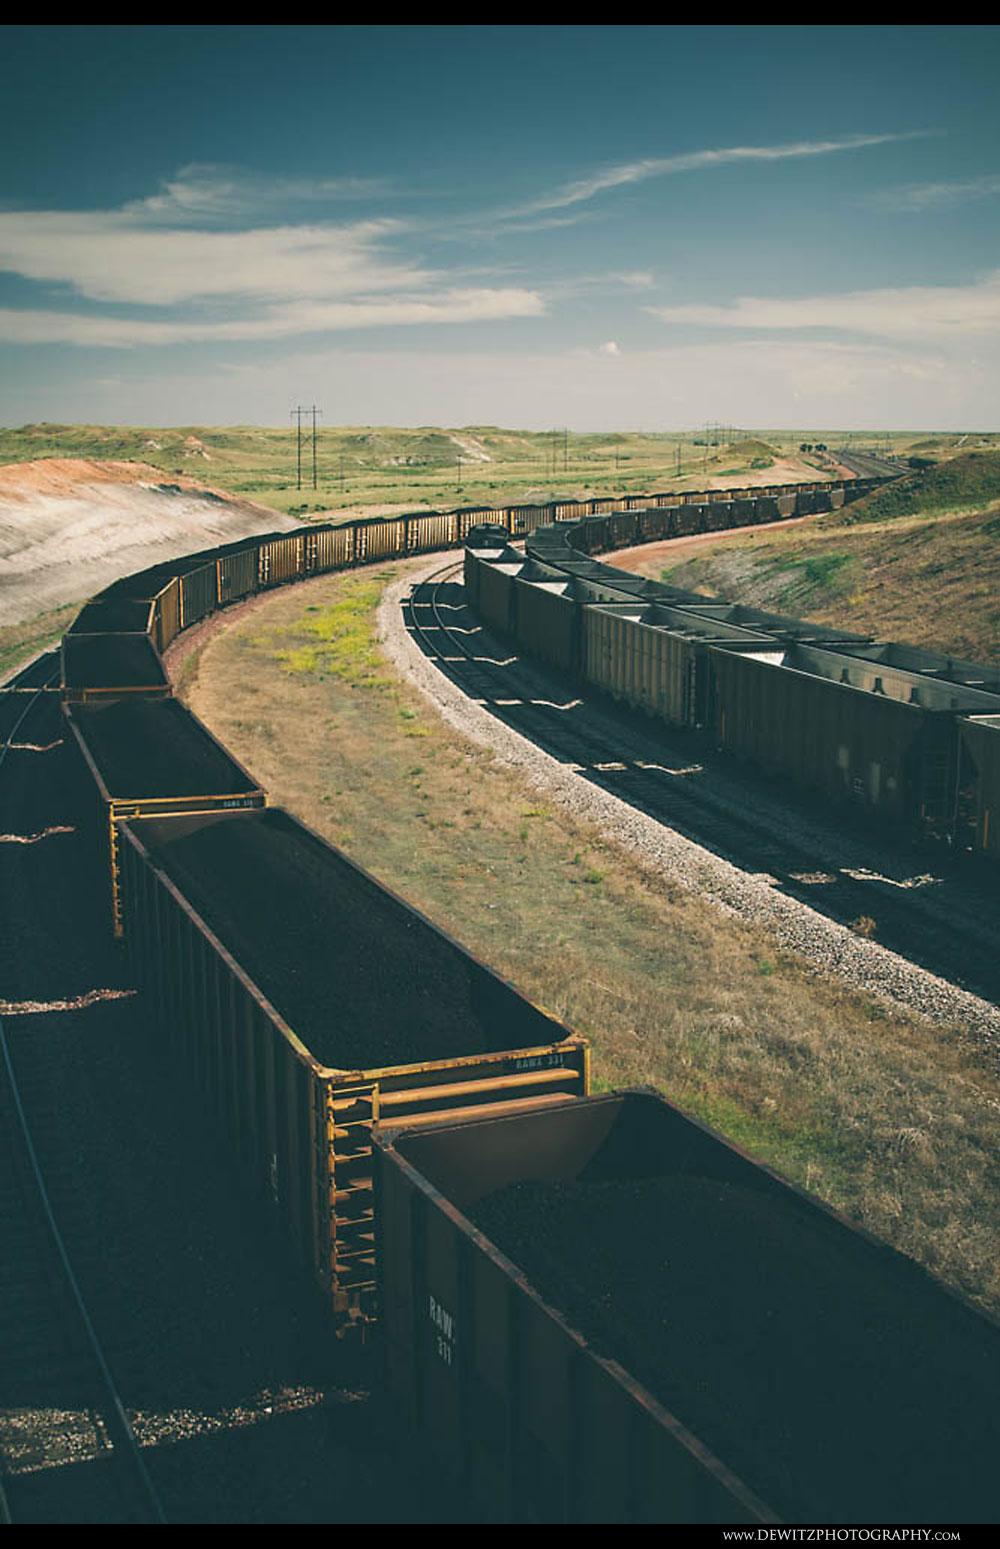 337Coal Trains Sit at Antelope Mine